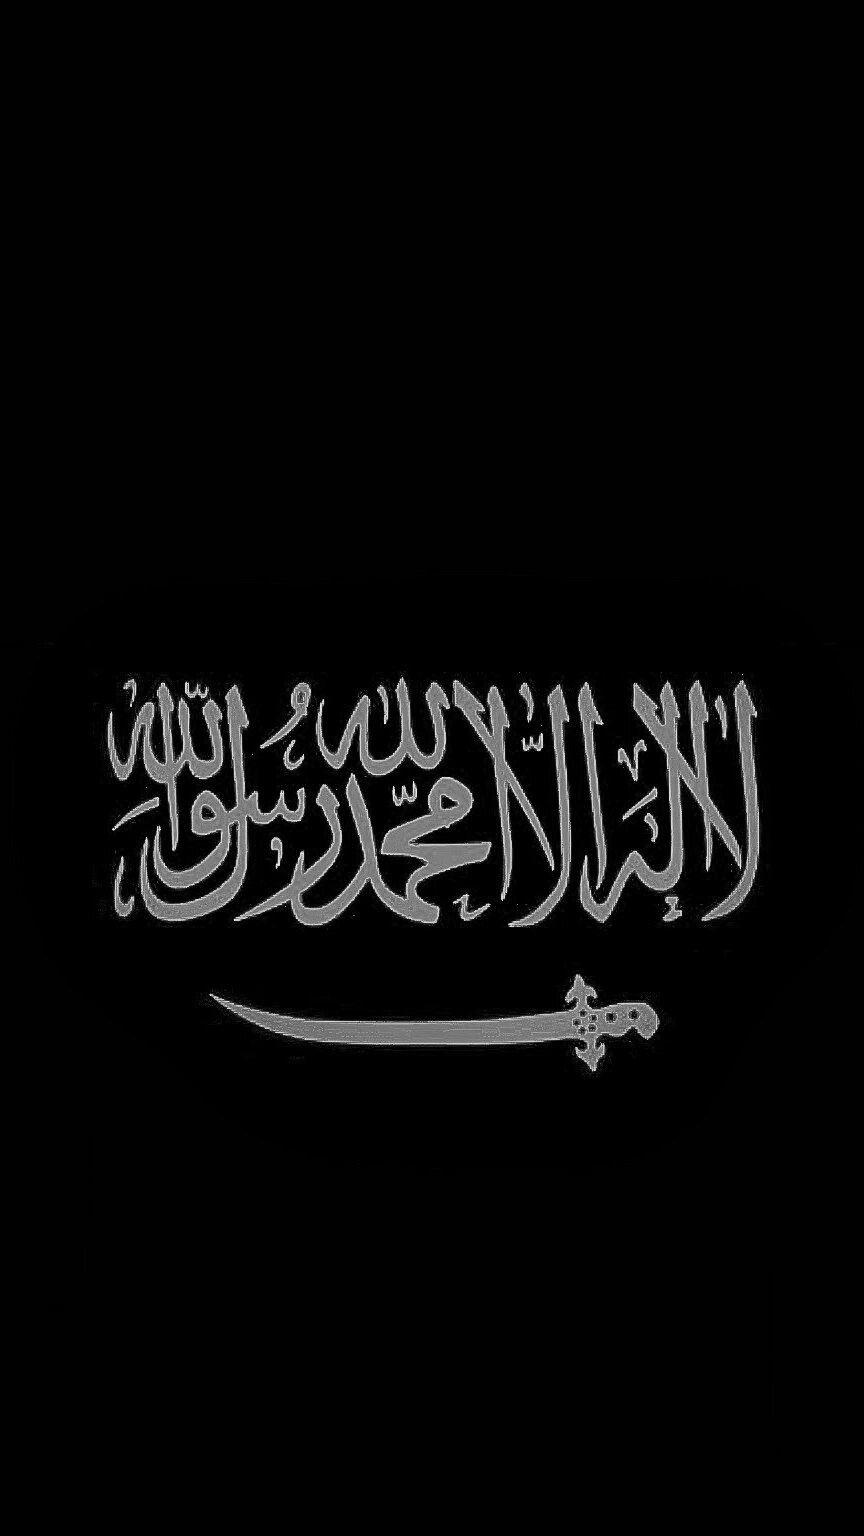 Versions Share C By Rhendy Hostta Thank You For Visiting My Pin In Pinterest Seni Kaligrafi Cinta Allah Teknik Fotografi